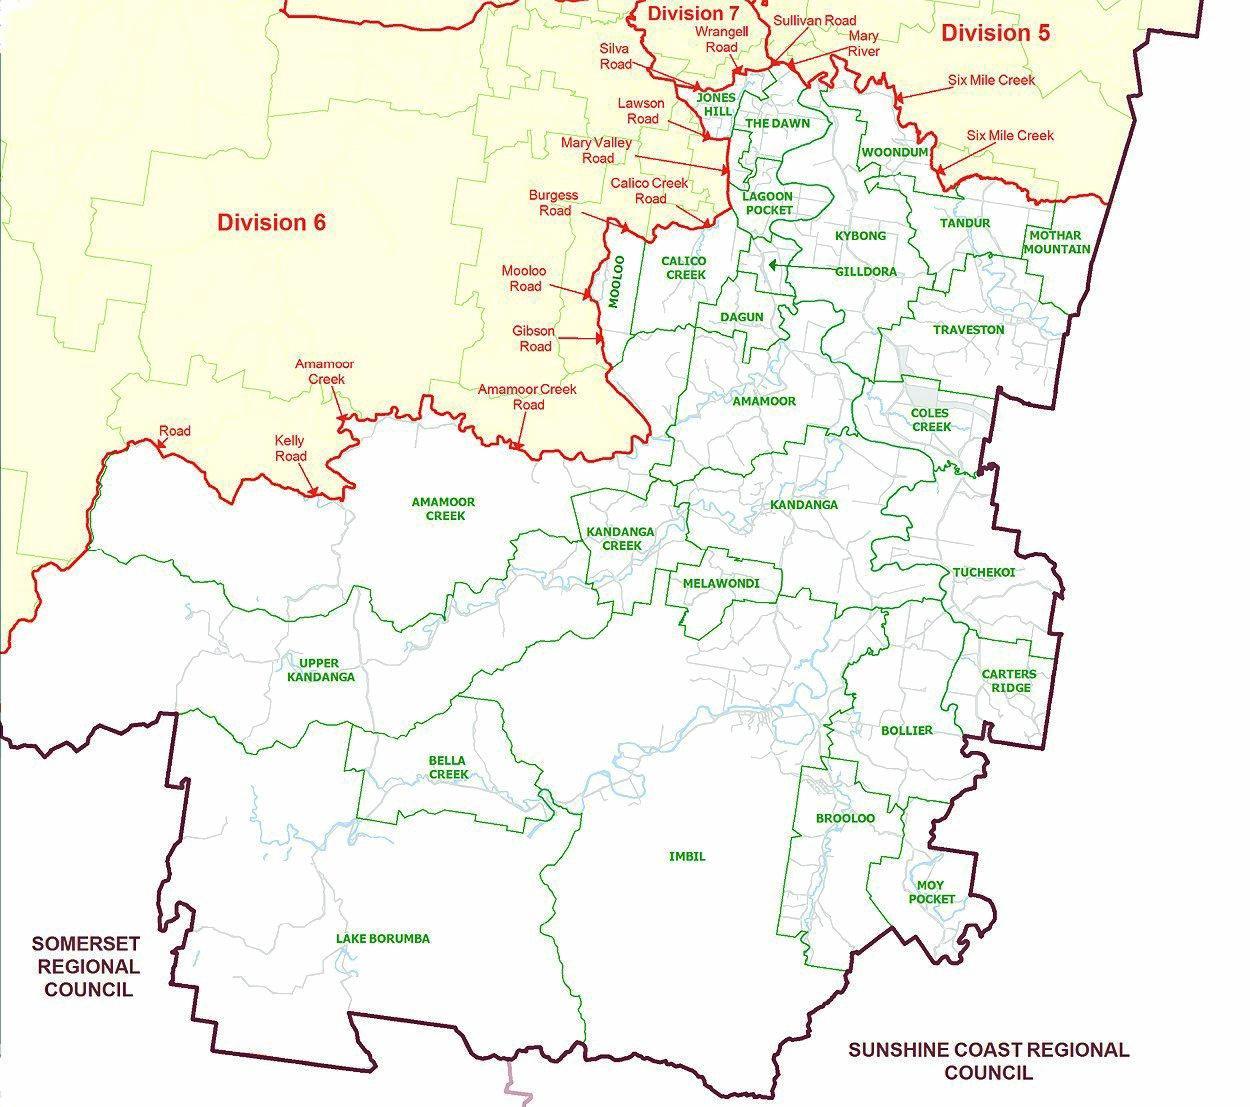 Gympie Regional Council Division 8.